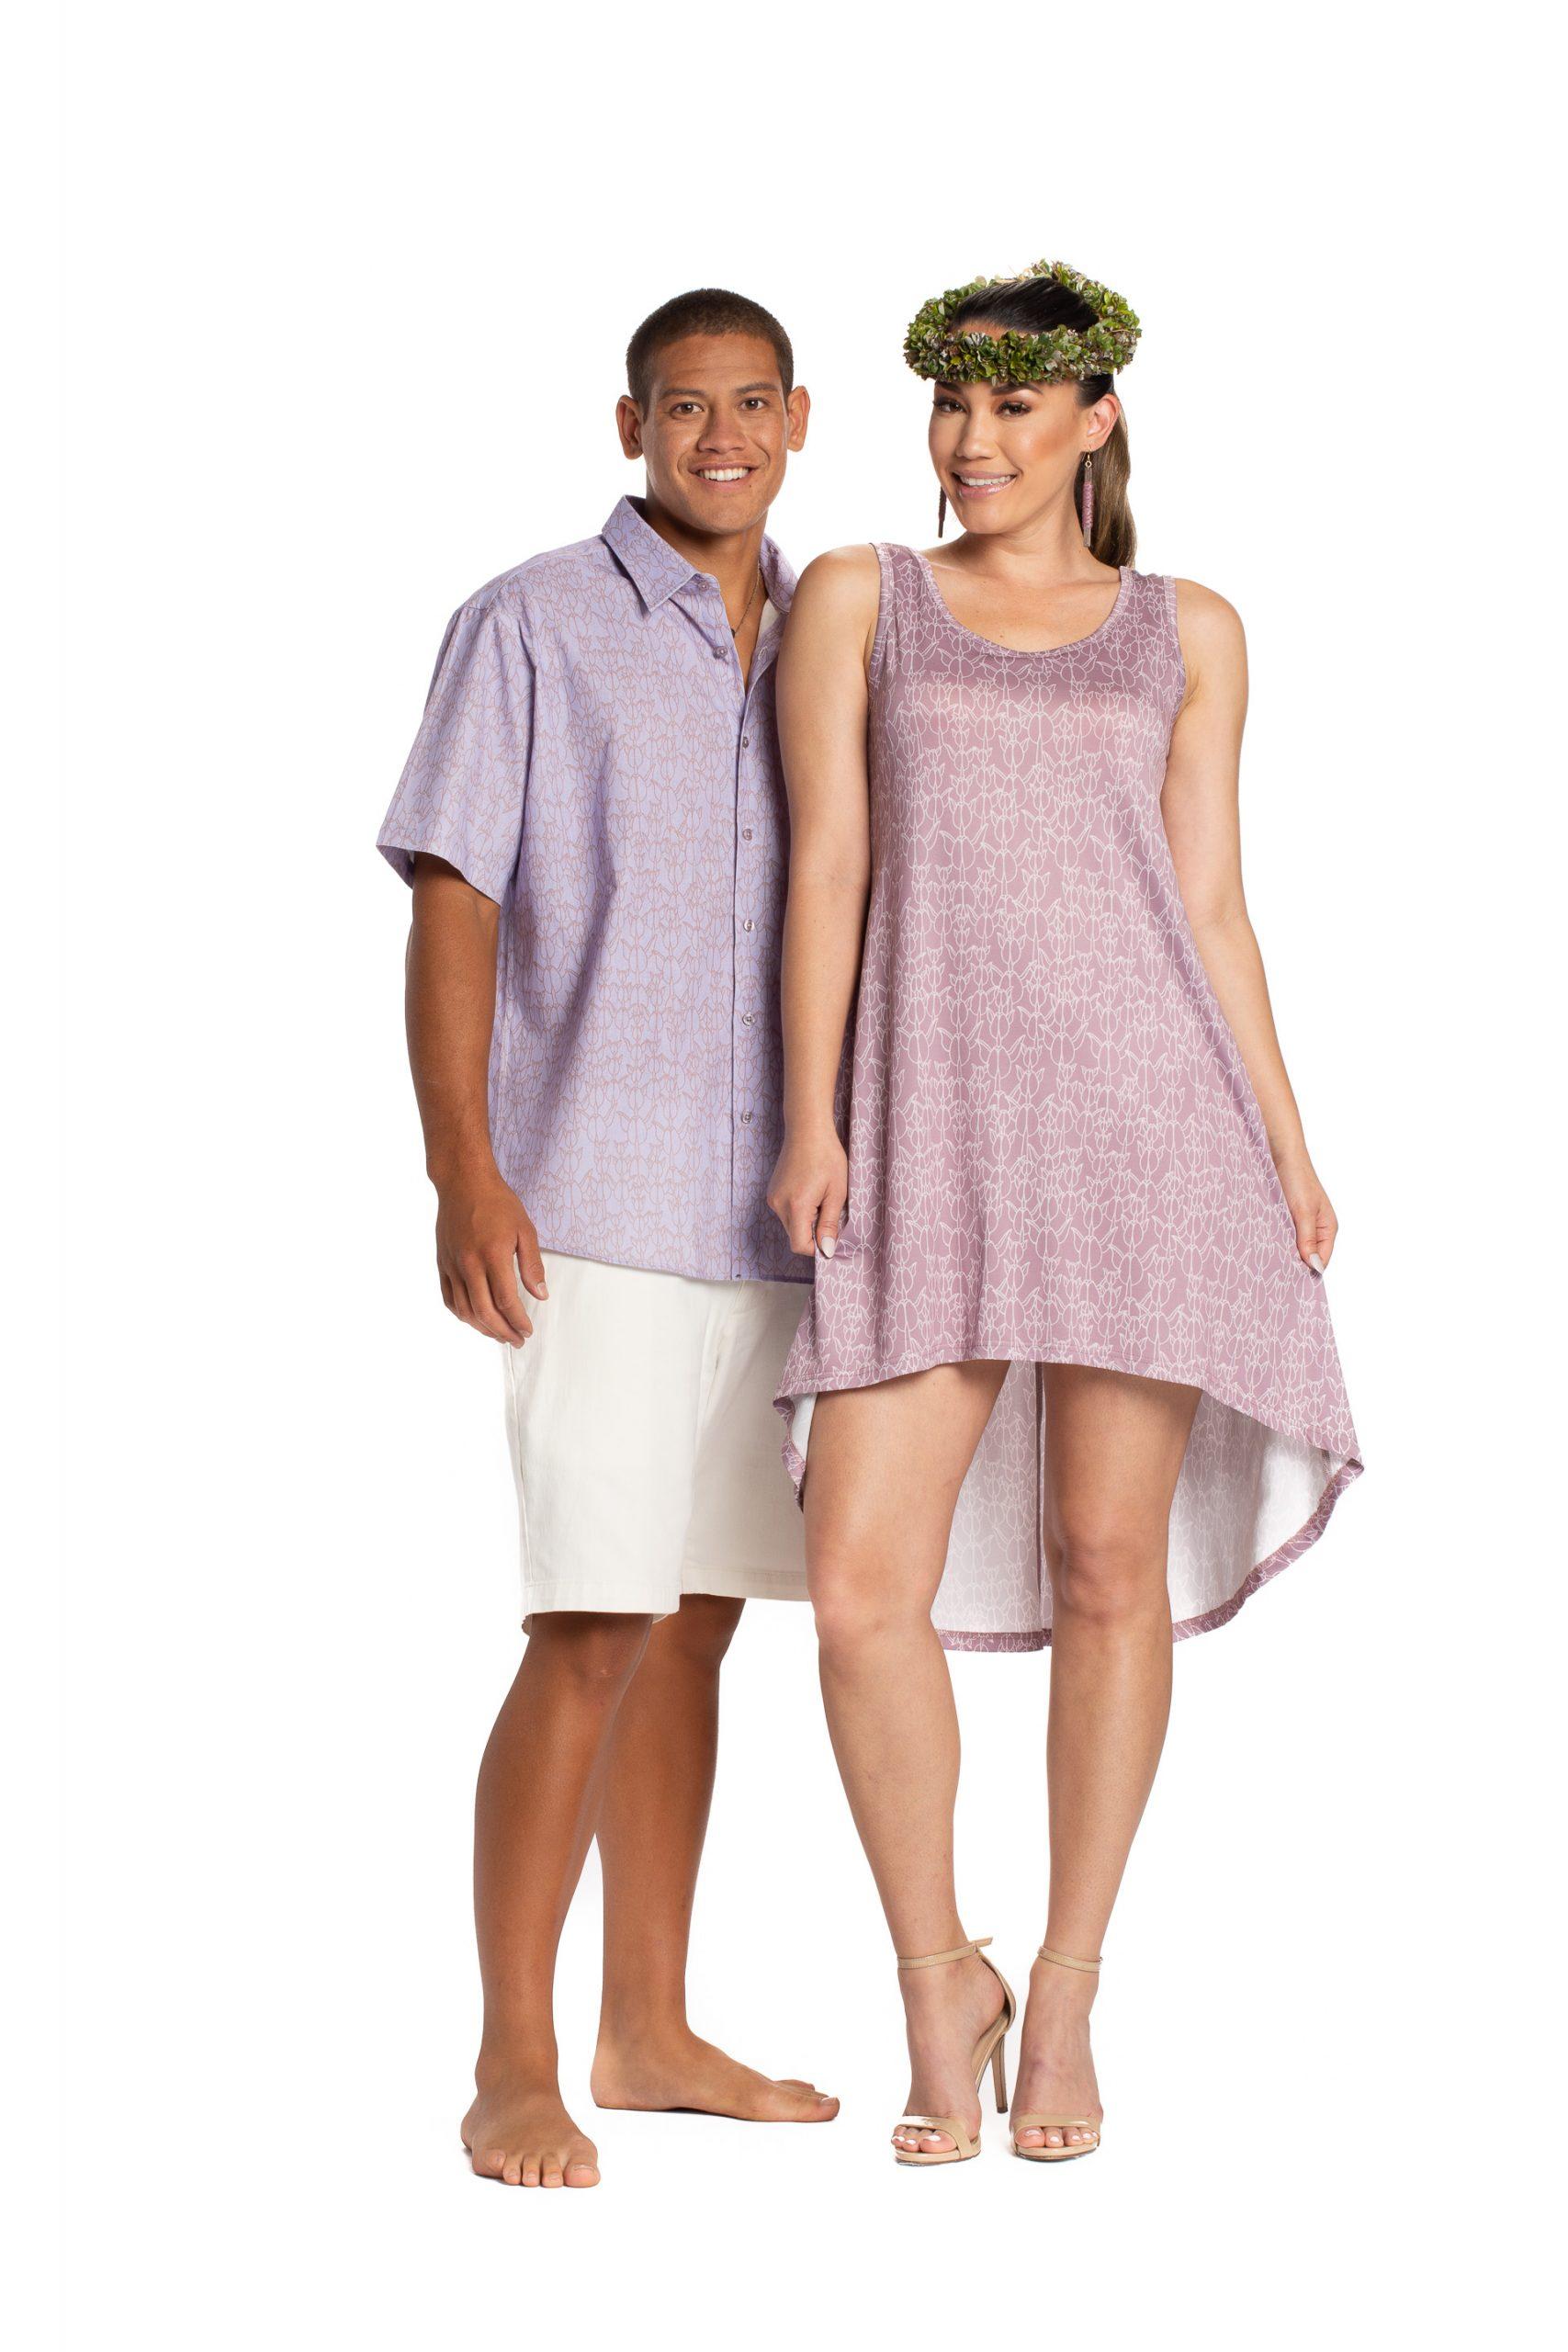 Model wearing a Waikoloa High Low Dress and male model wearing a purple Aloha Shirt